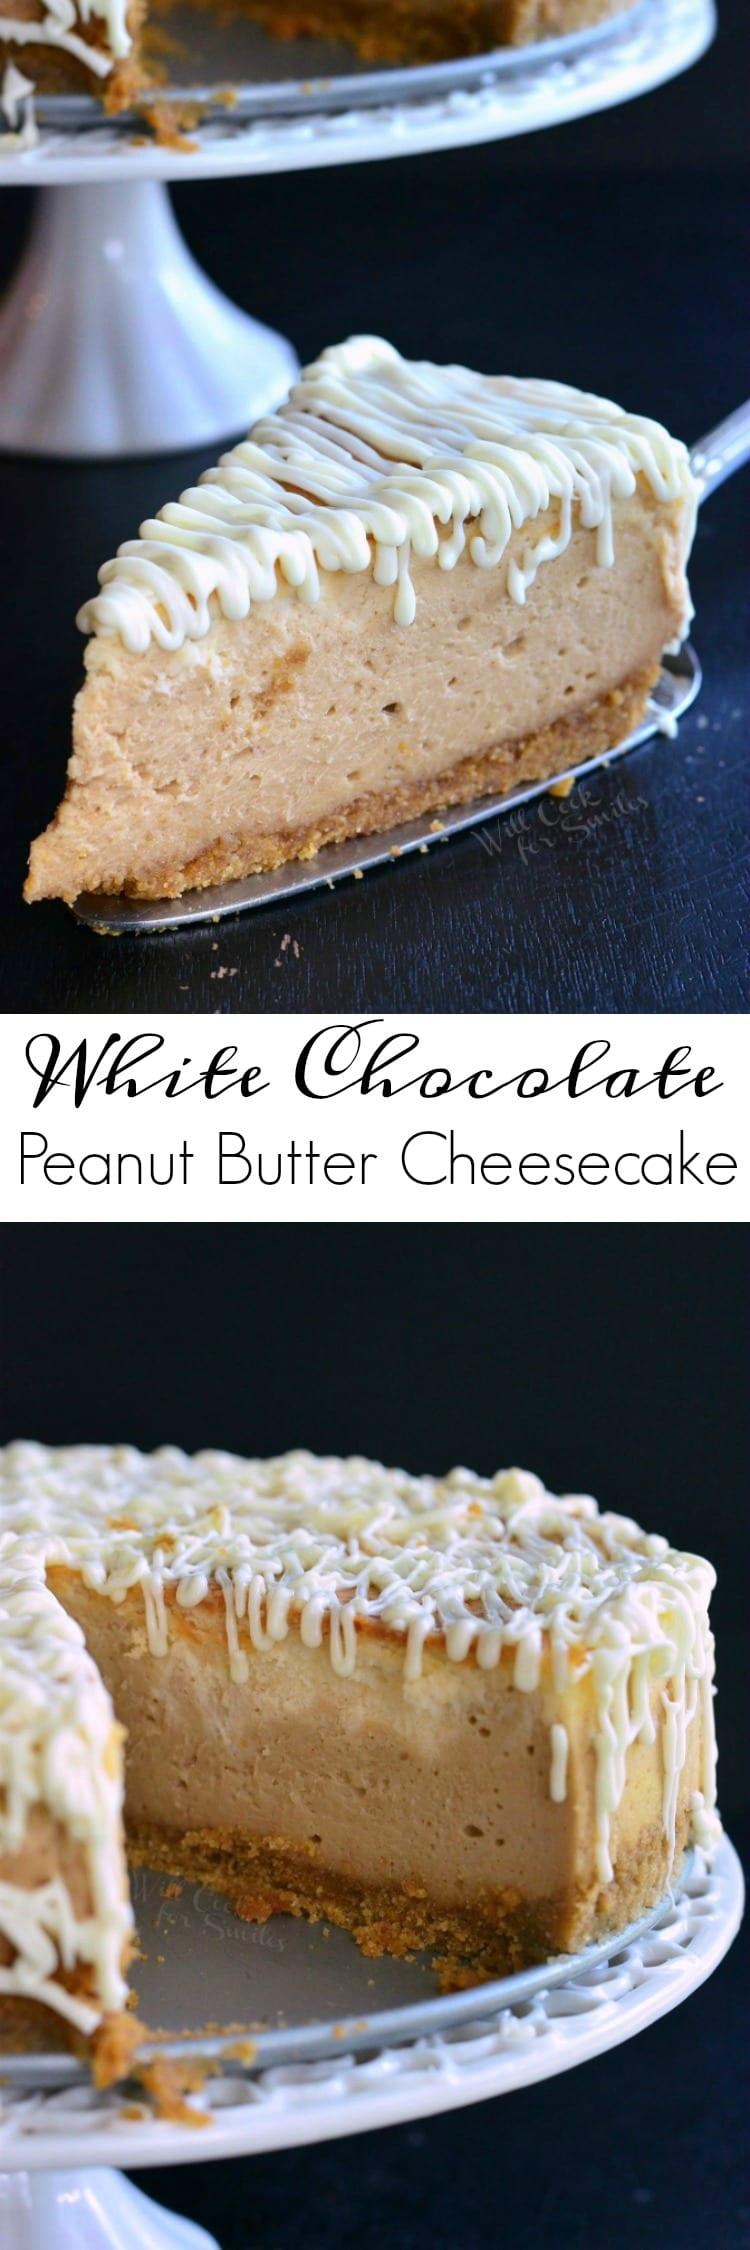 Spider Web Cheesecake (White Chocolate Peanut Butter Cheesecake ...